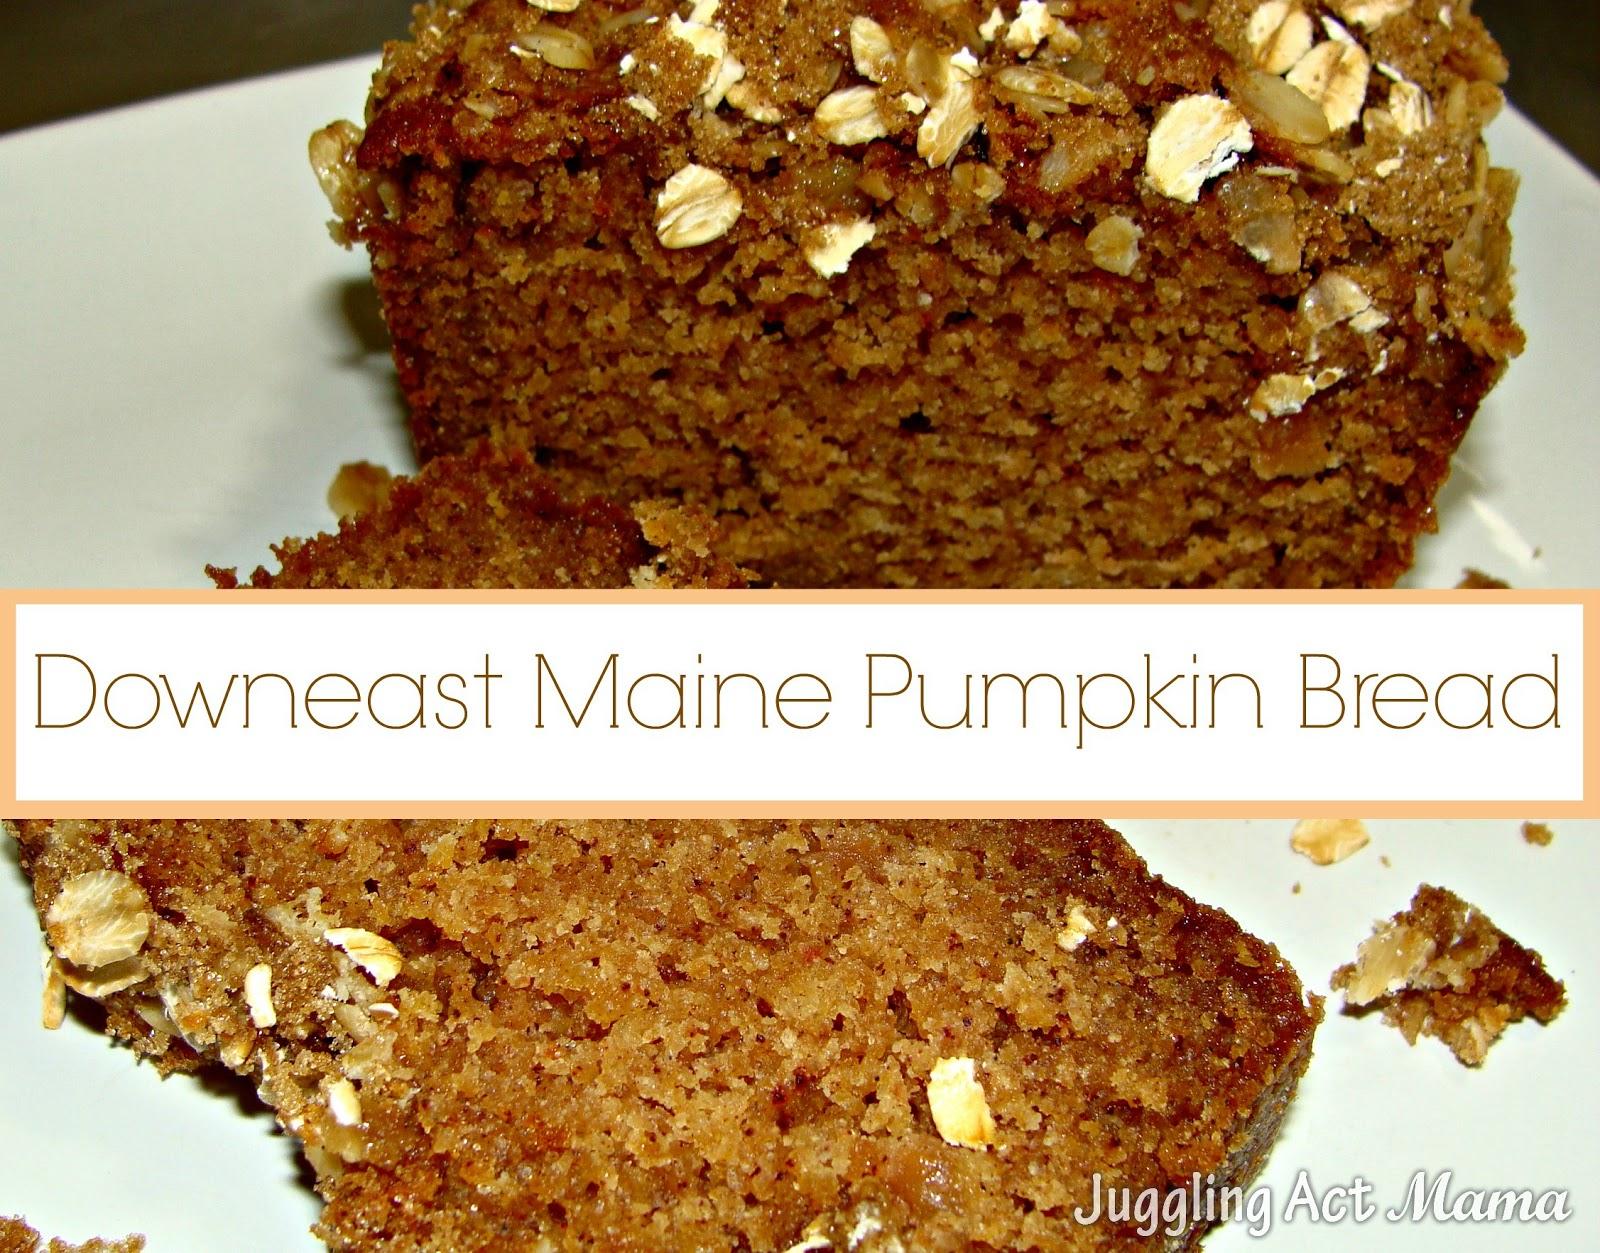 ... bread pumpkin bread pumpkin bread paleo pumpkin bread pumpkin bread